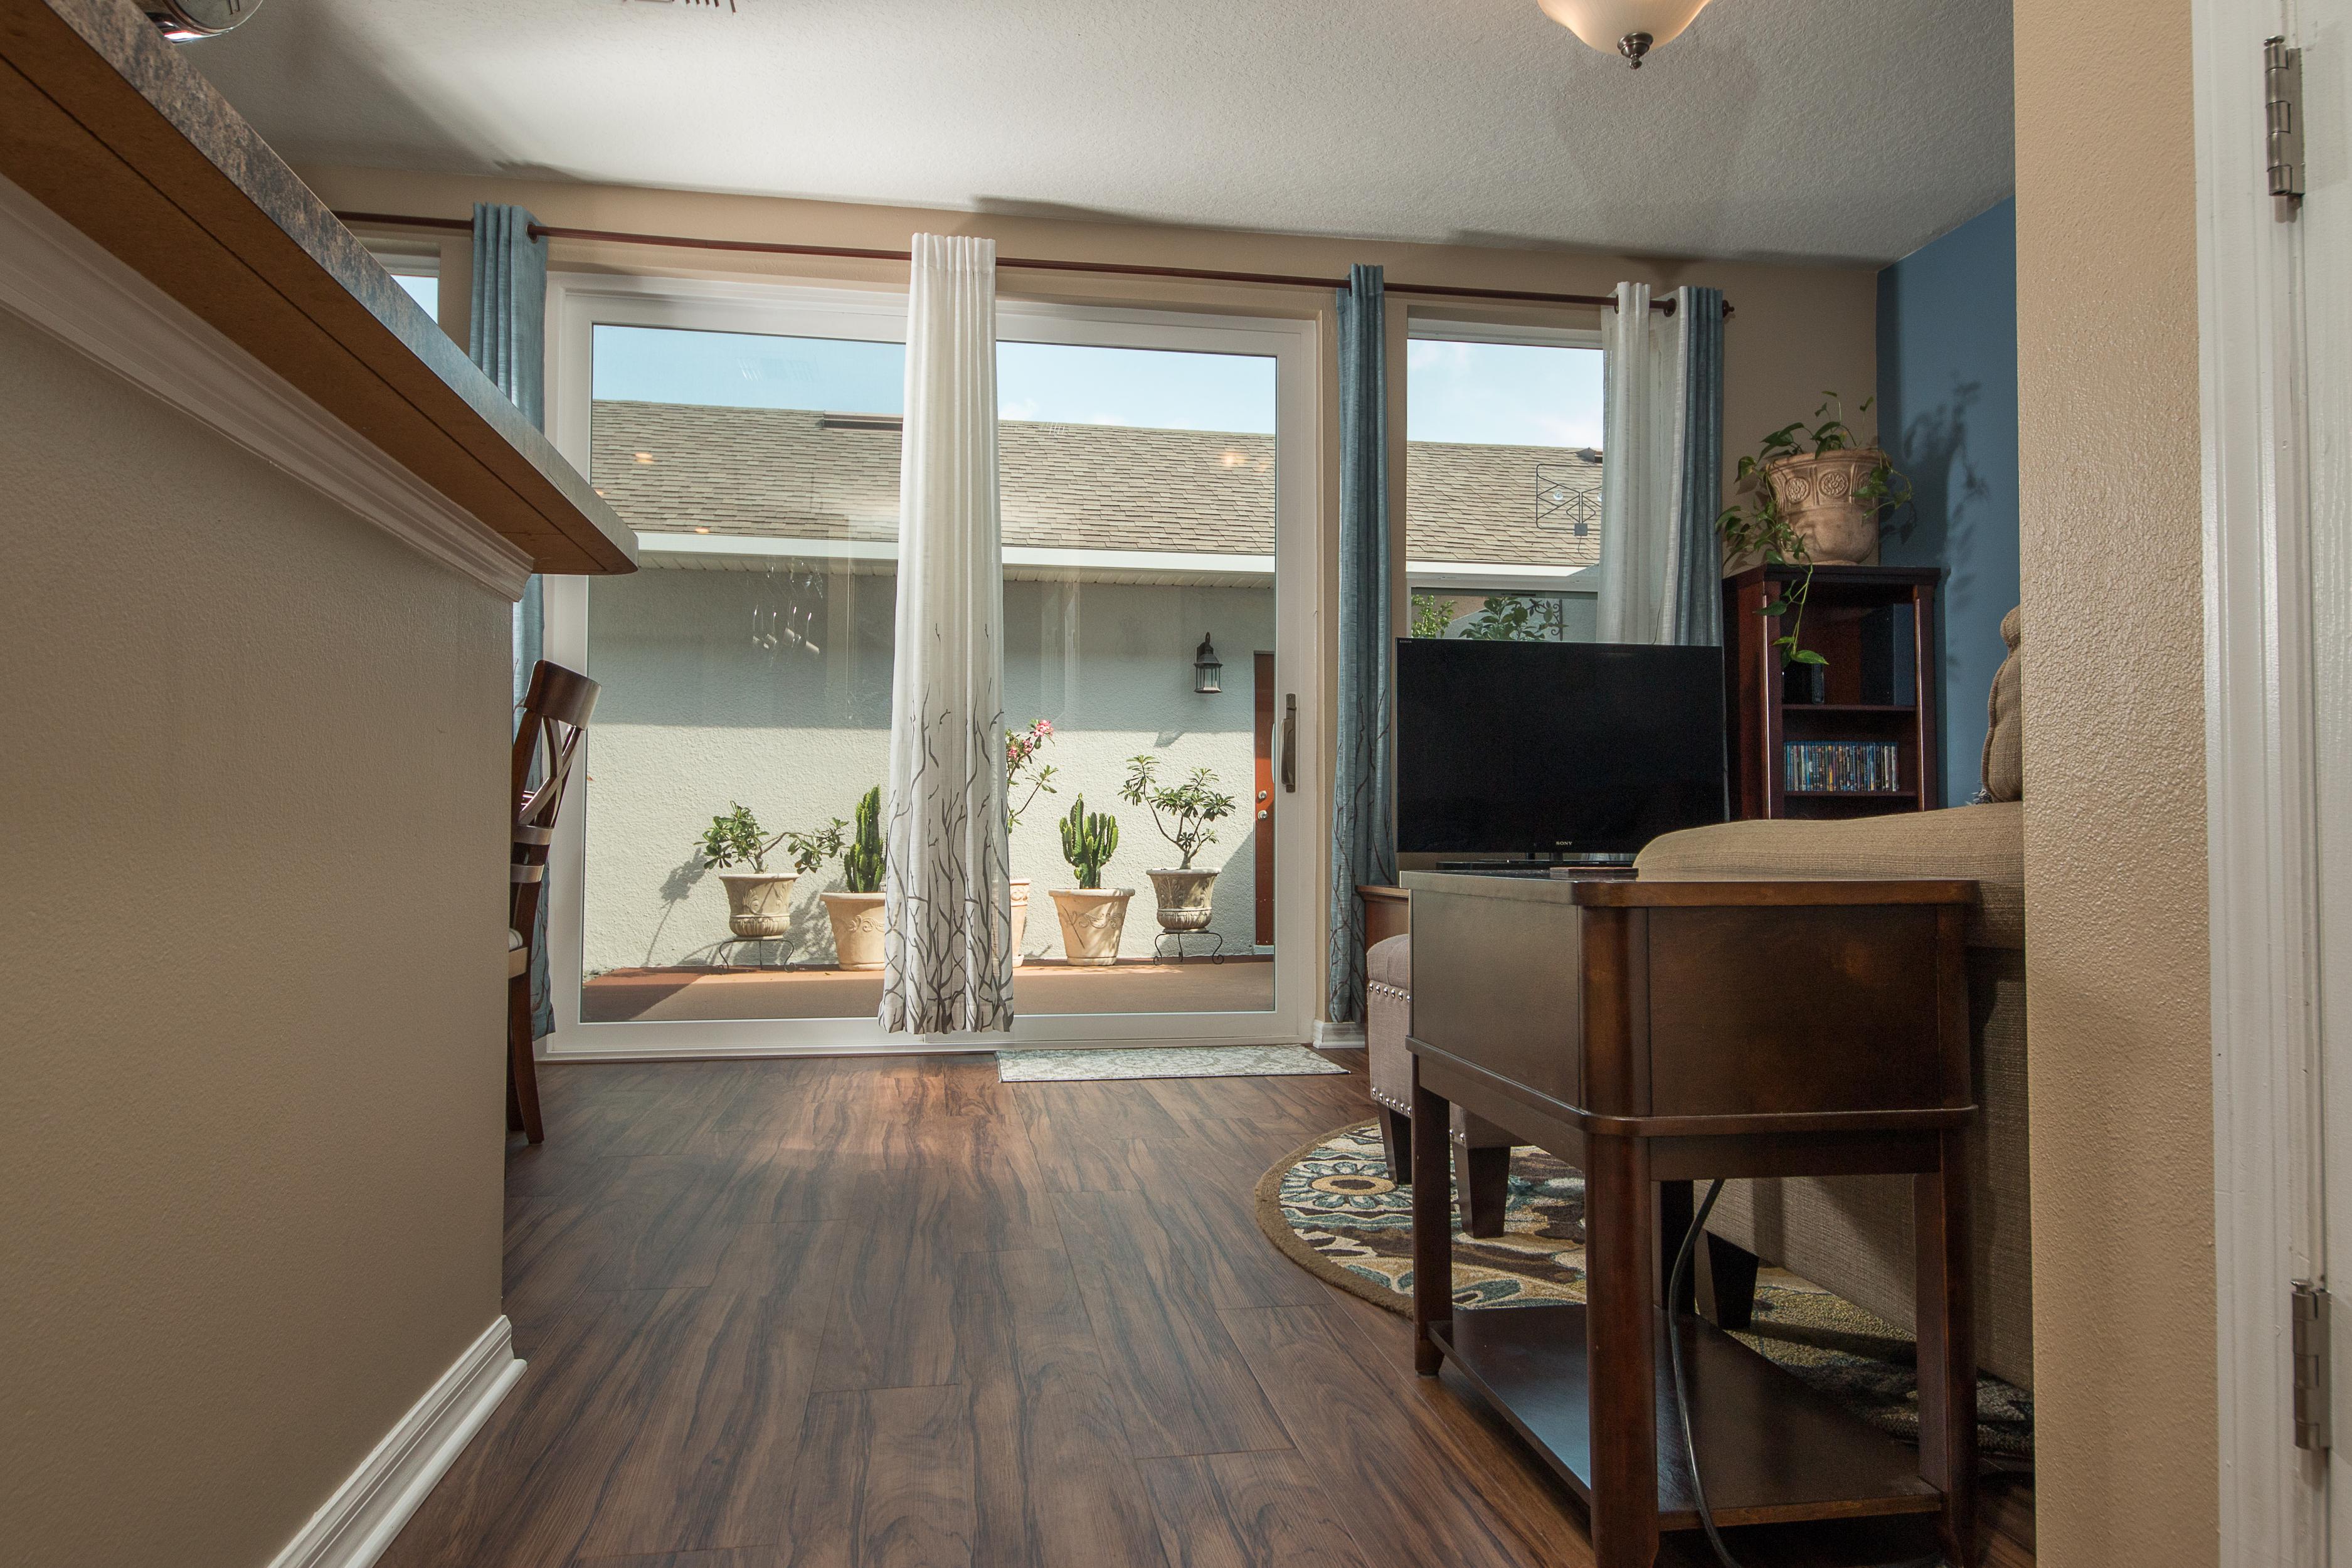 PVC Vinyl & Gray Carpet flooring kitchen, breakfast nook and sitting room